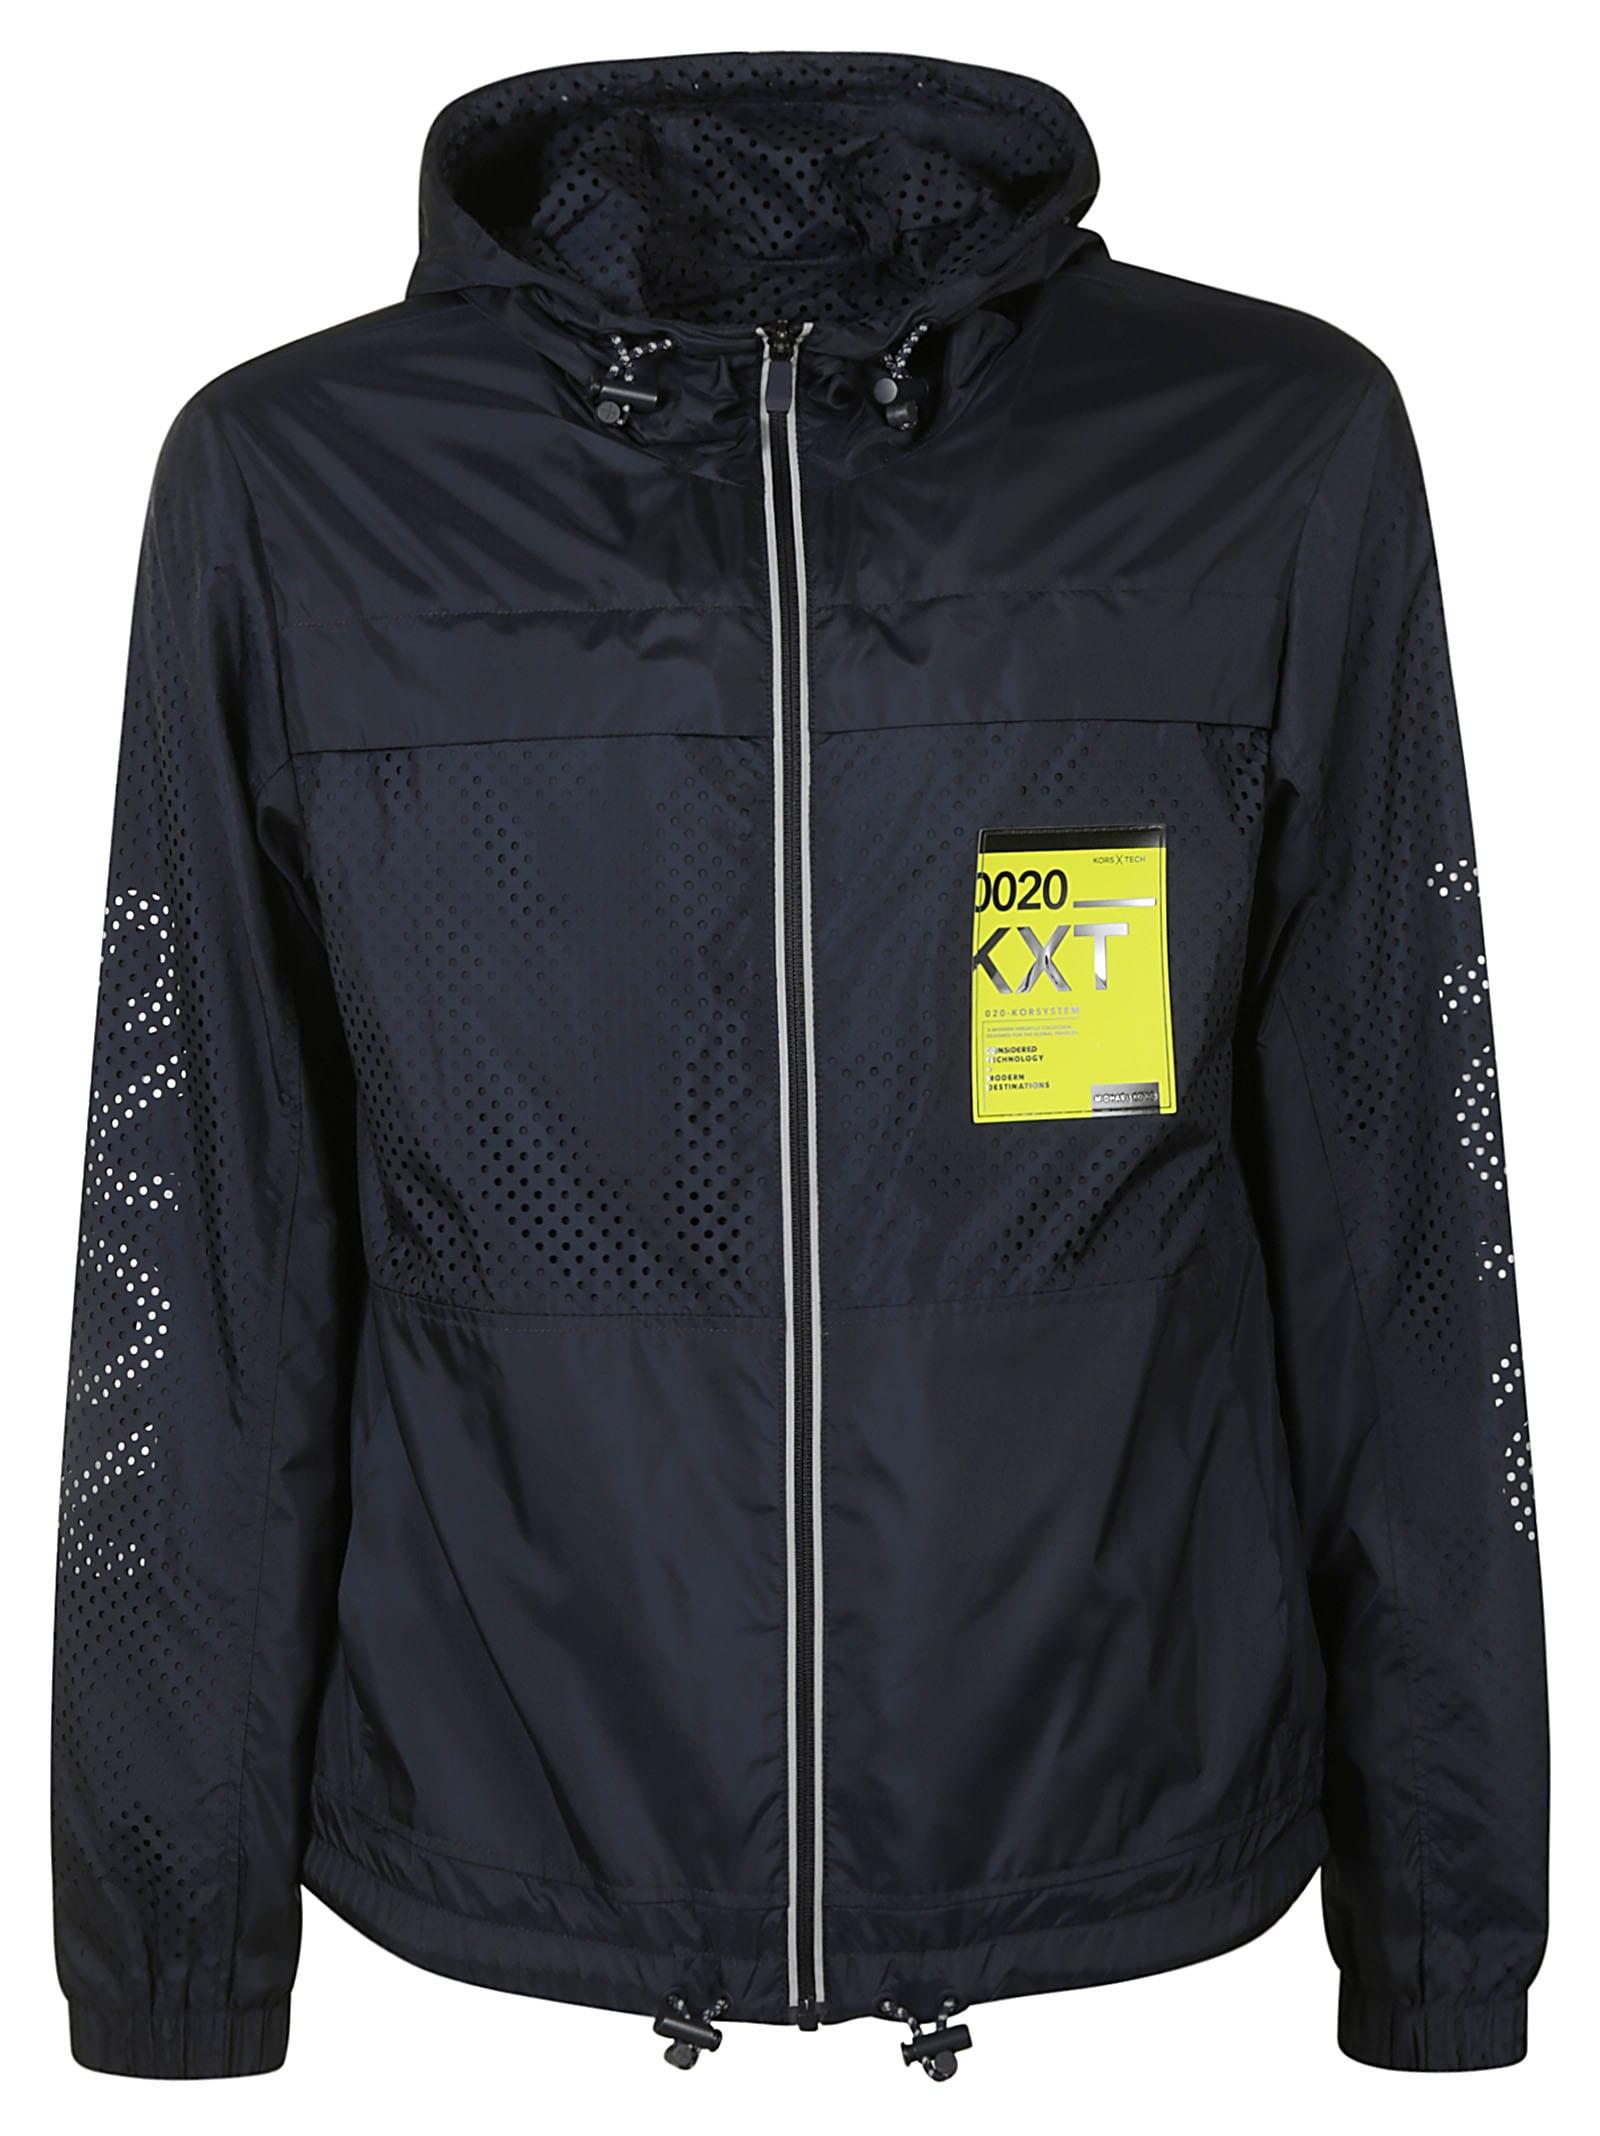 Michael Kors Perforated Zip Jacket